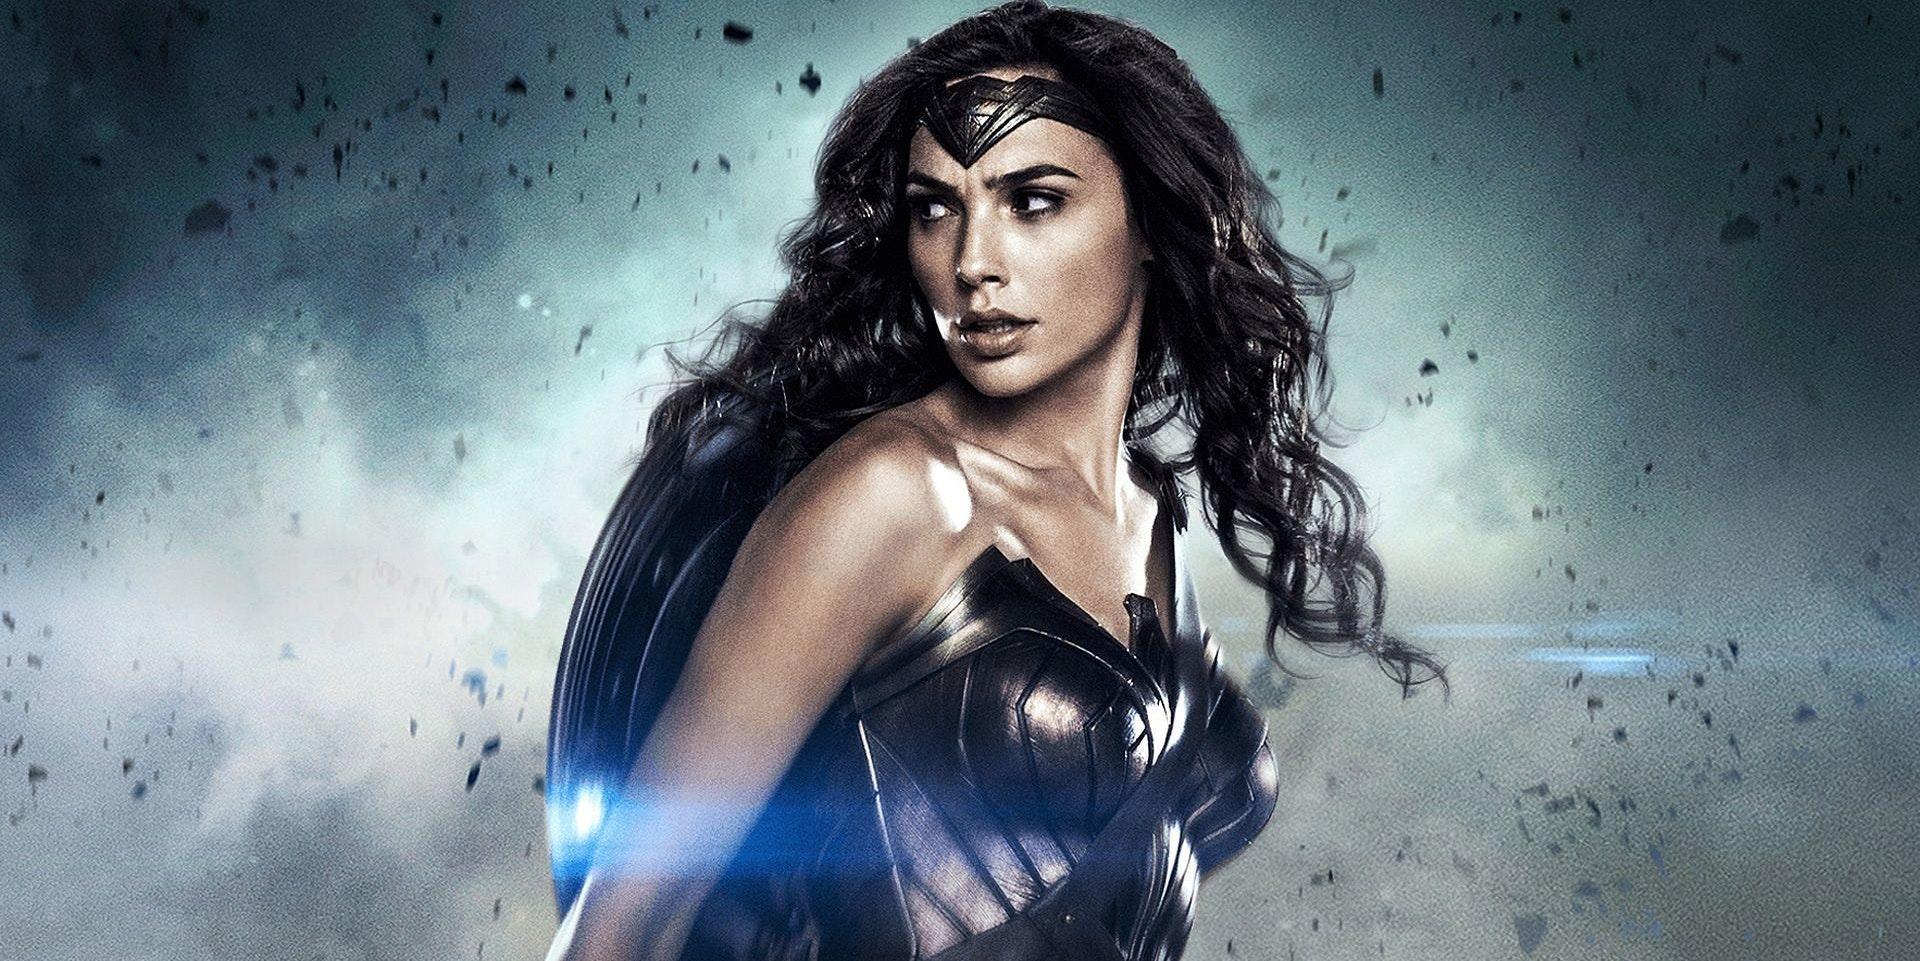 Gal Gadot as Wonder Woman in DC's Batman v Superman Dawn of Justice